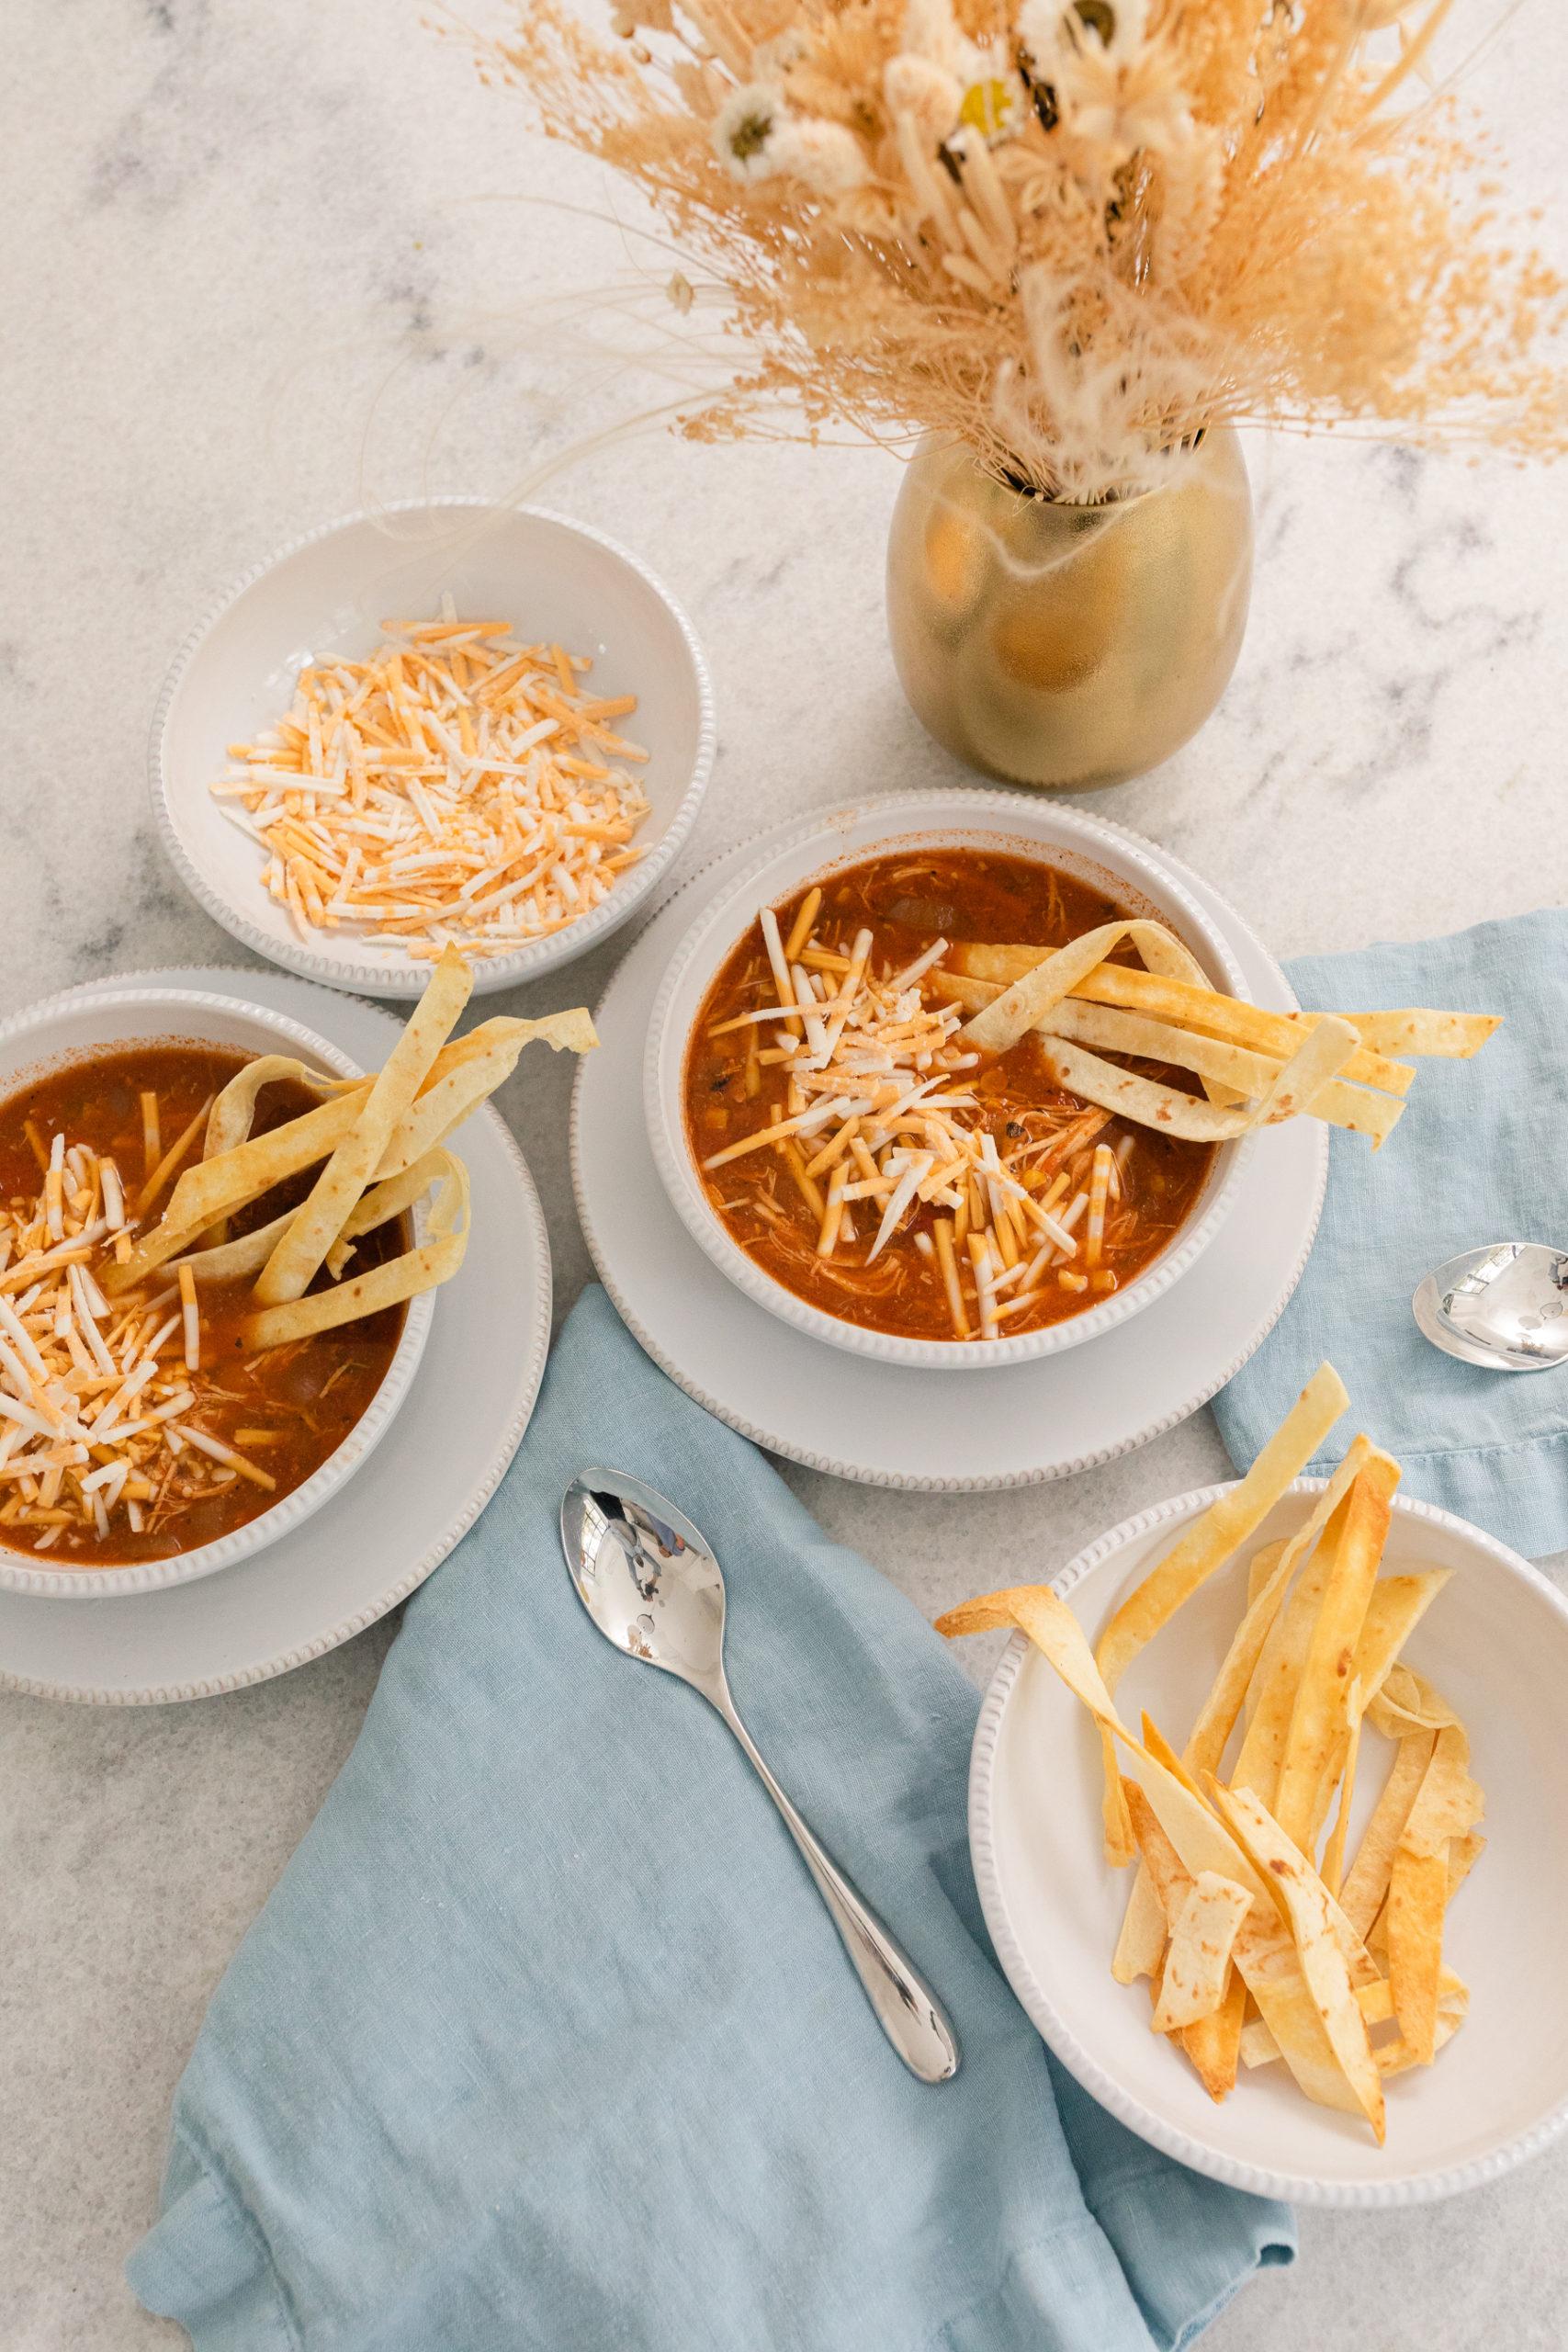 Eva Amurri's slow cooker chicken tortilla soup recipe